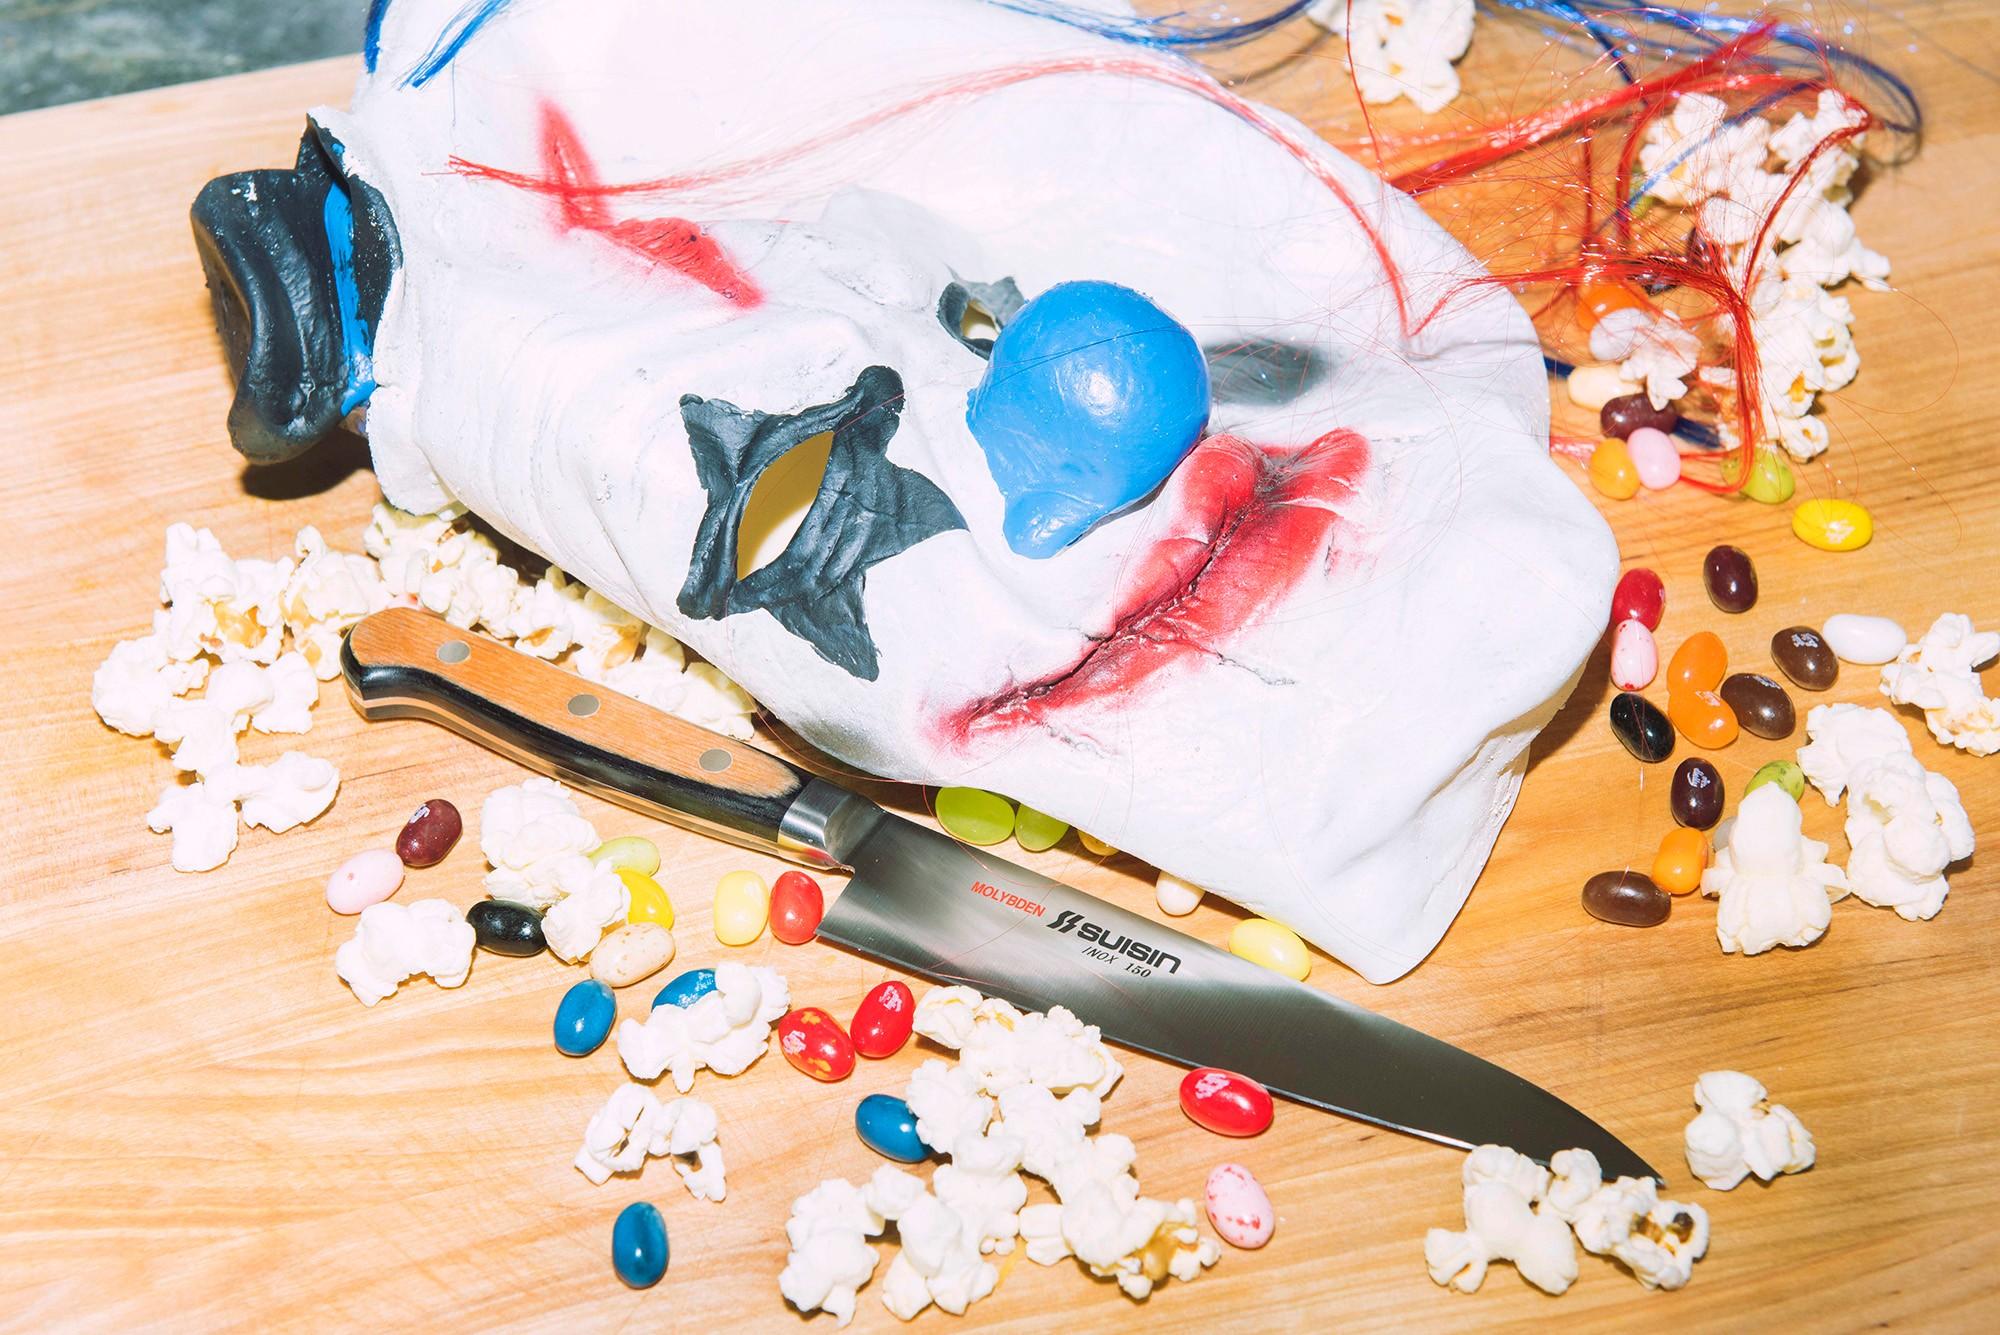 clown-knives-shoot-17